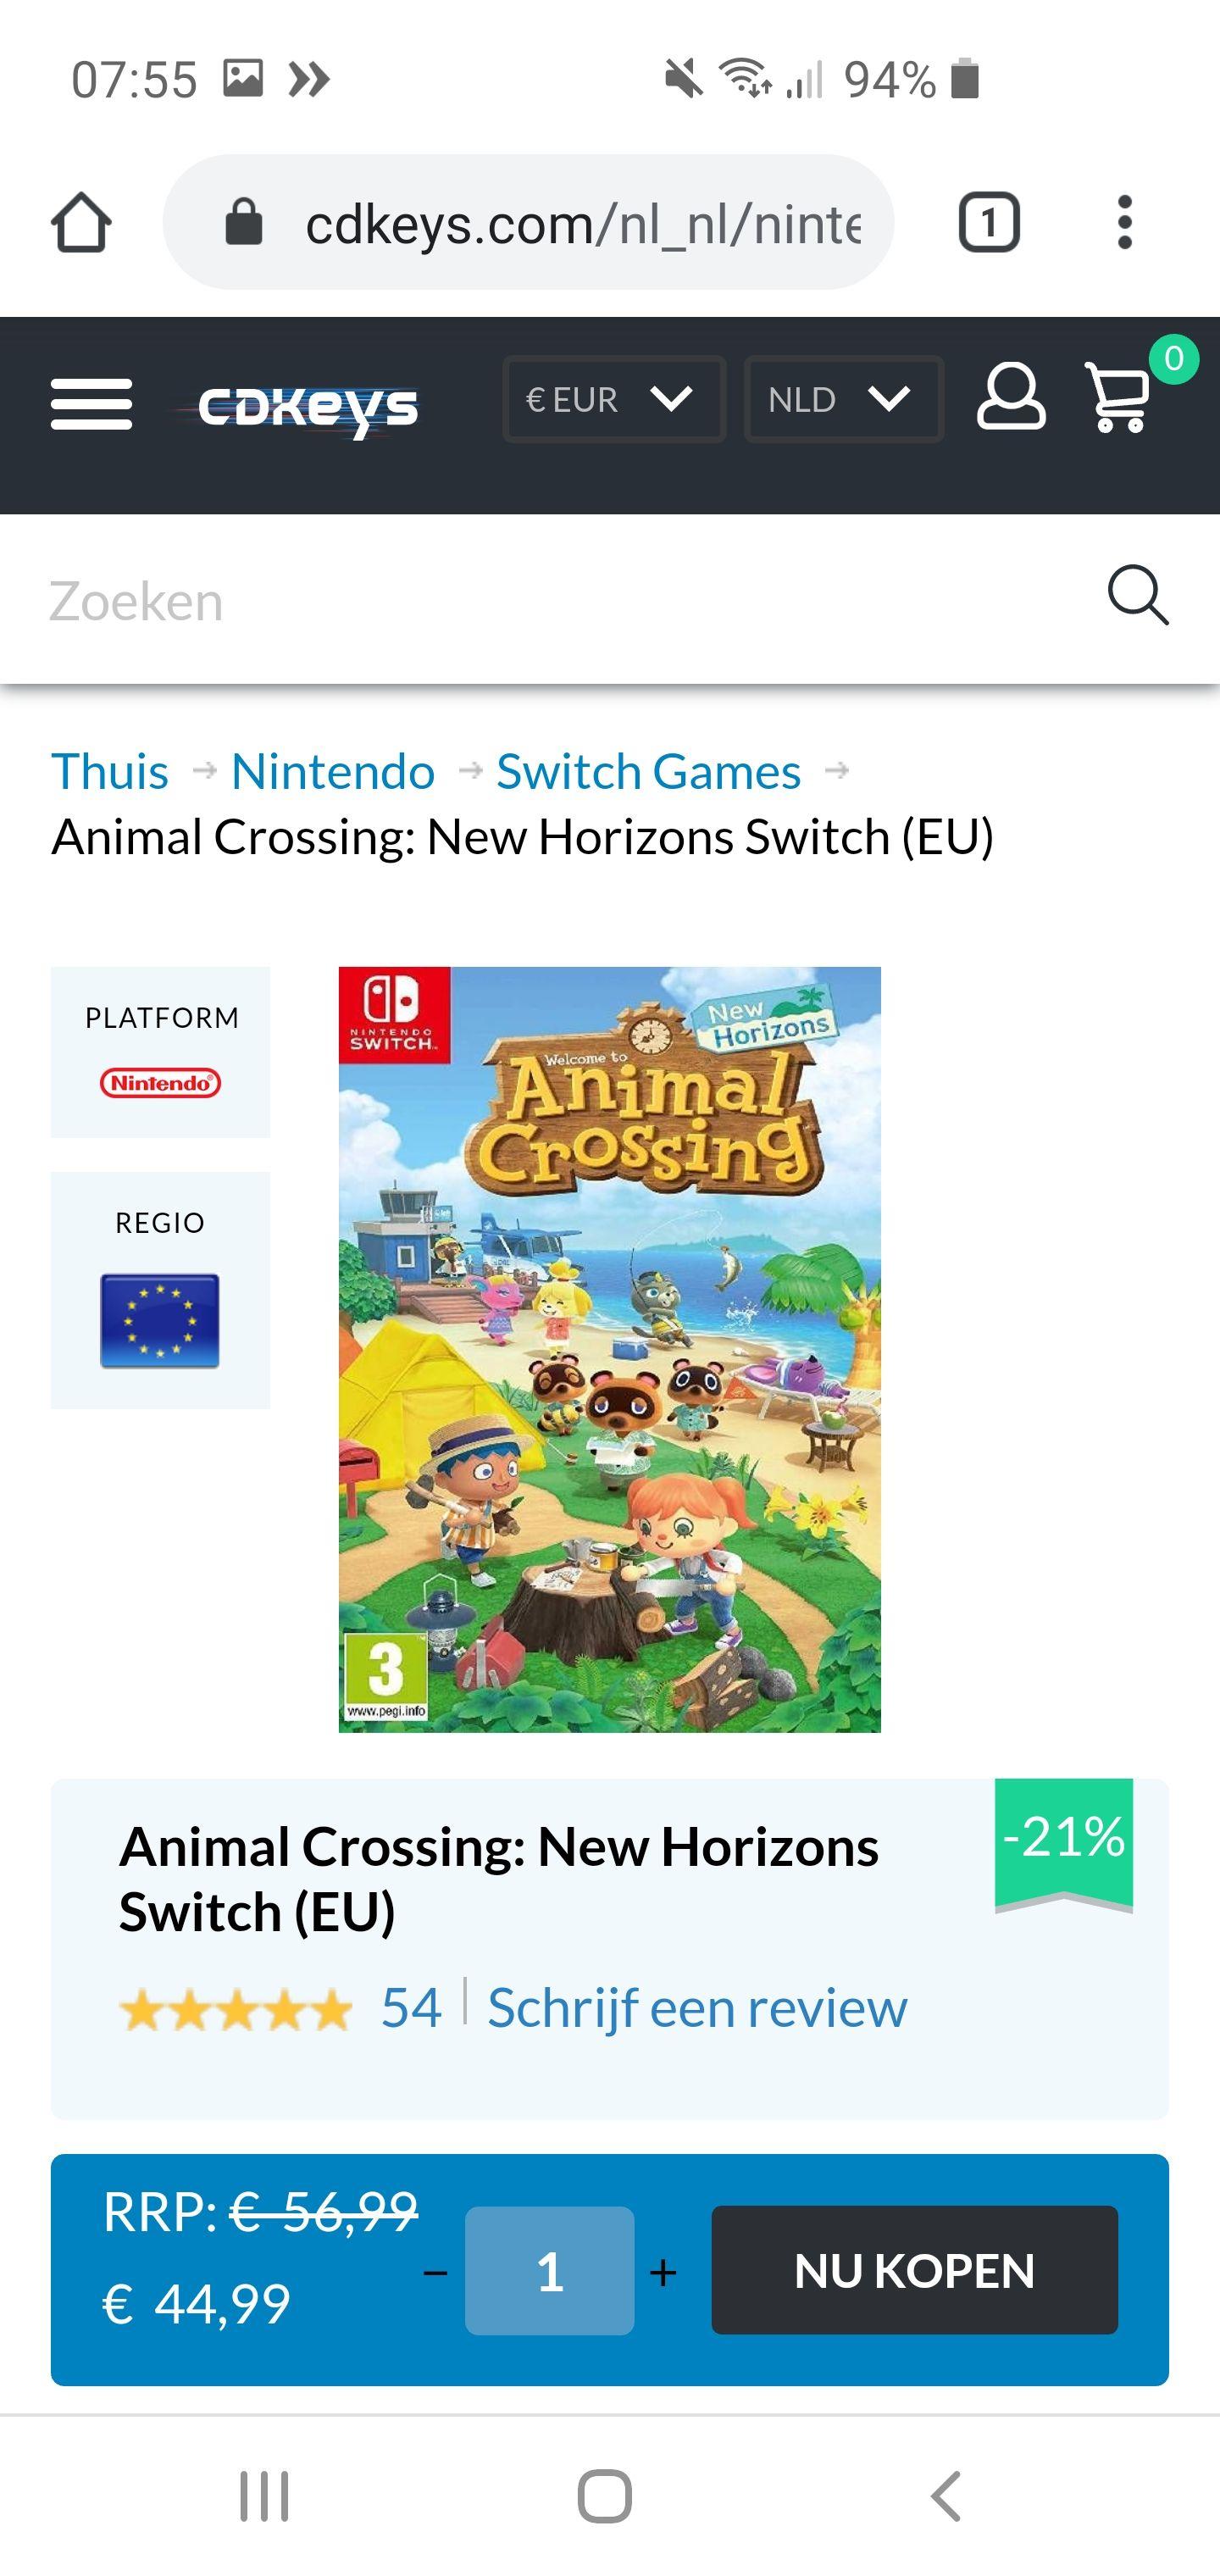 Animal Crossing: New Horizons - Switch (digitale versie)